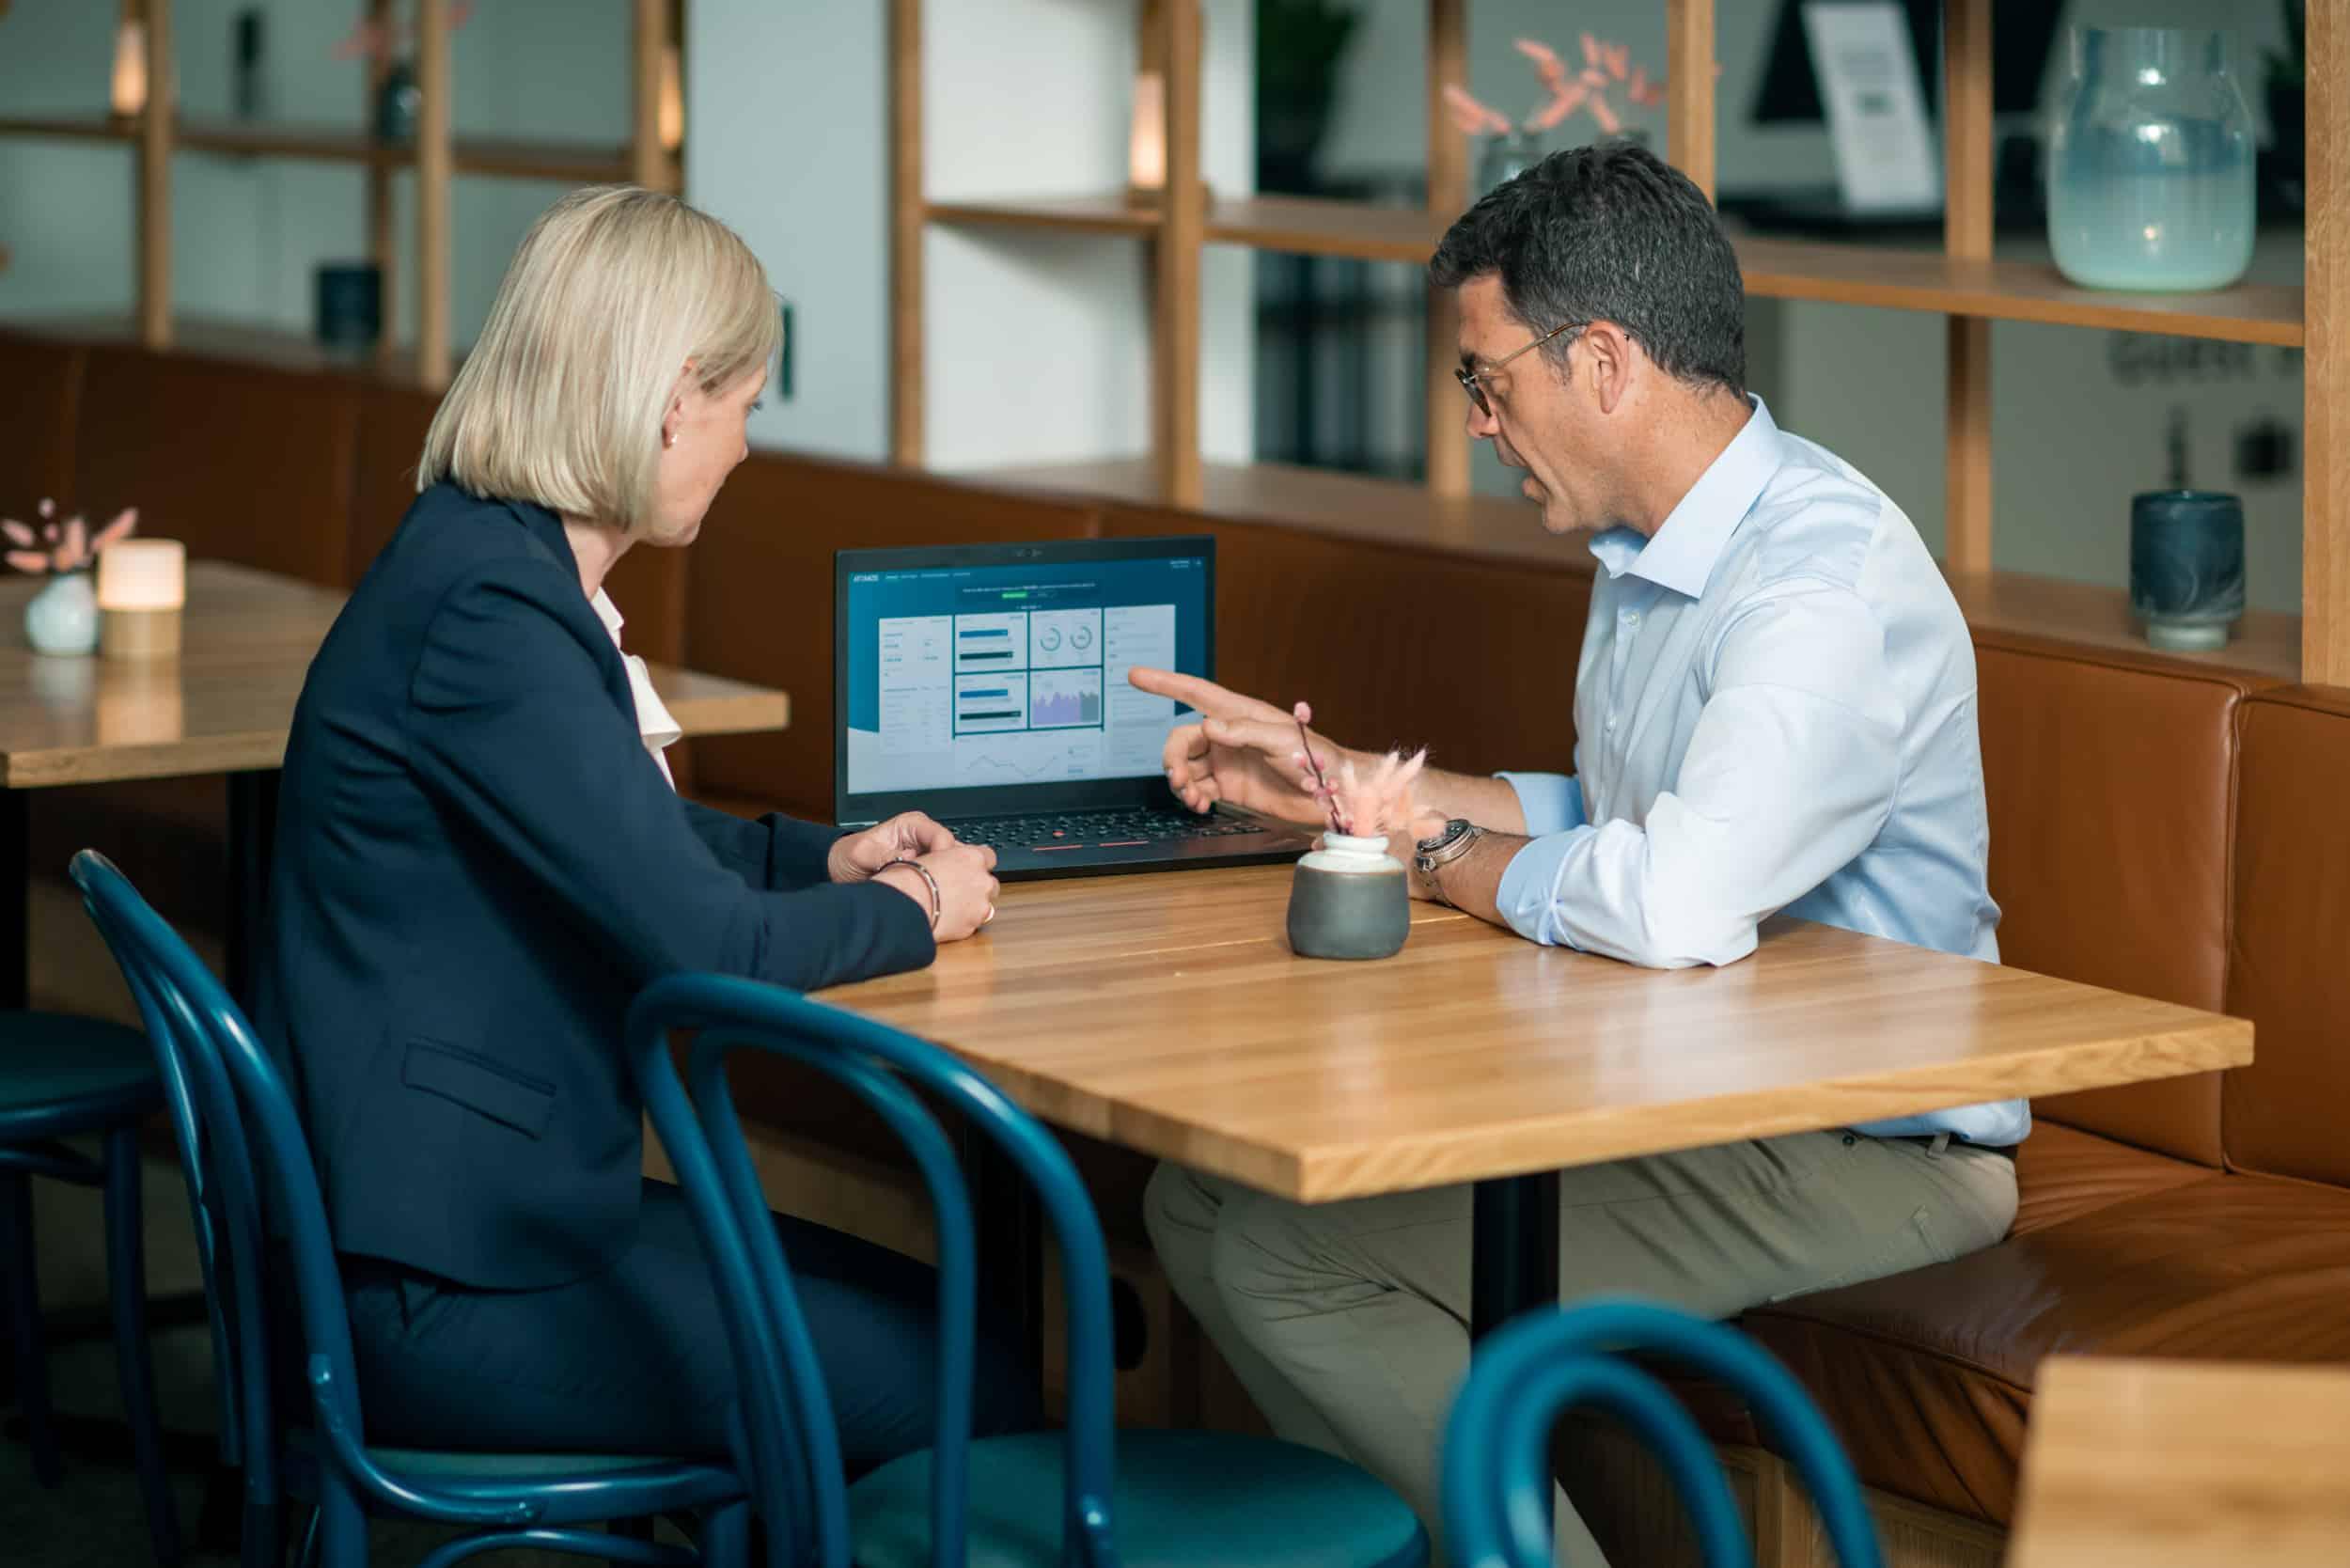 Revenue Management meeting in hotel